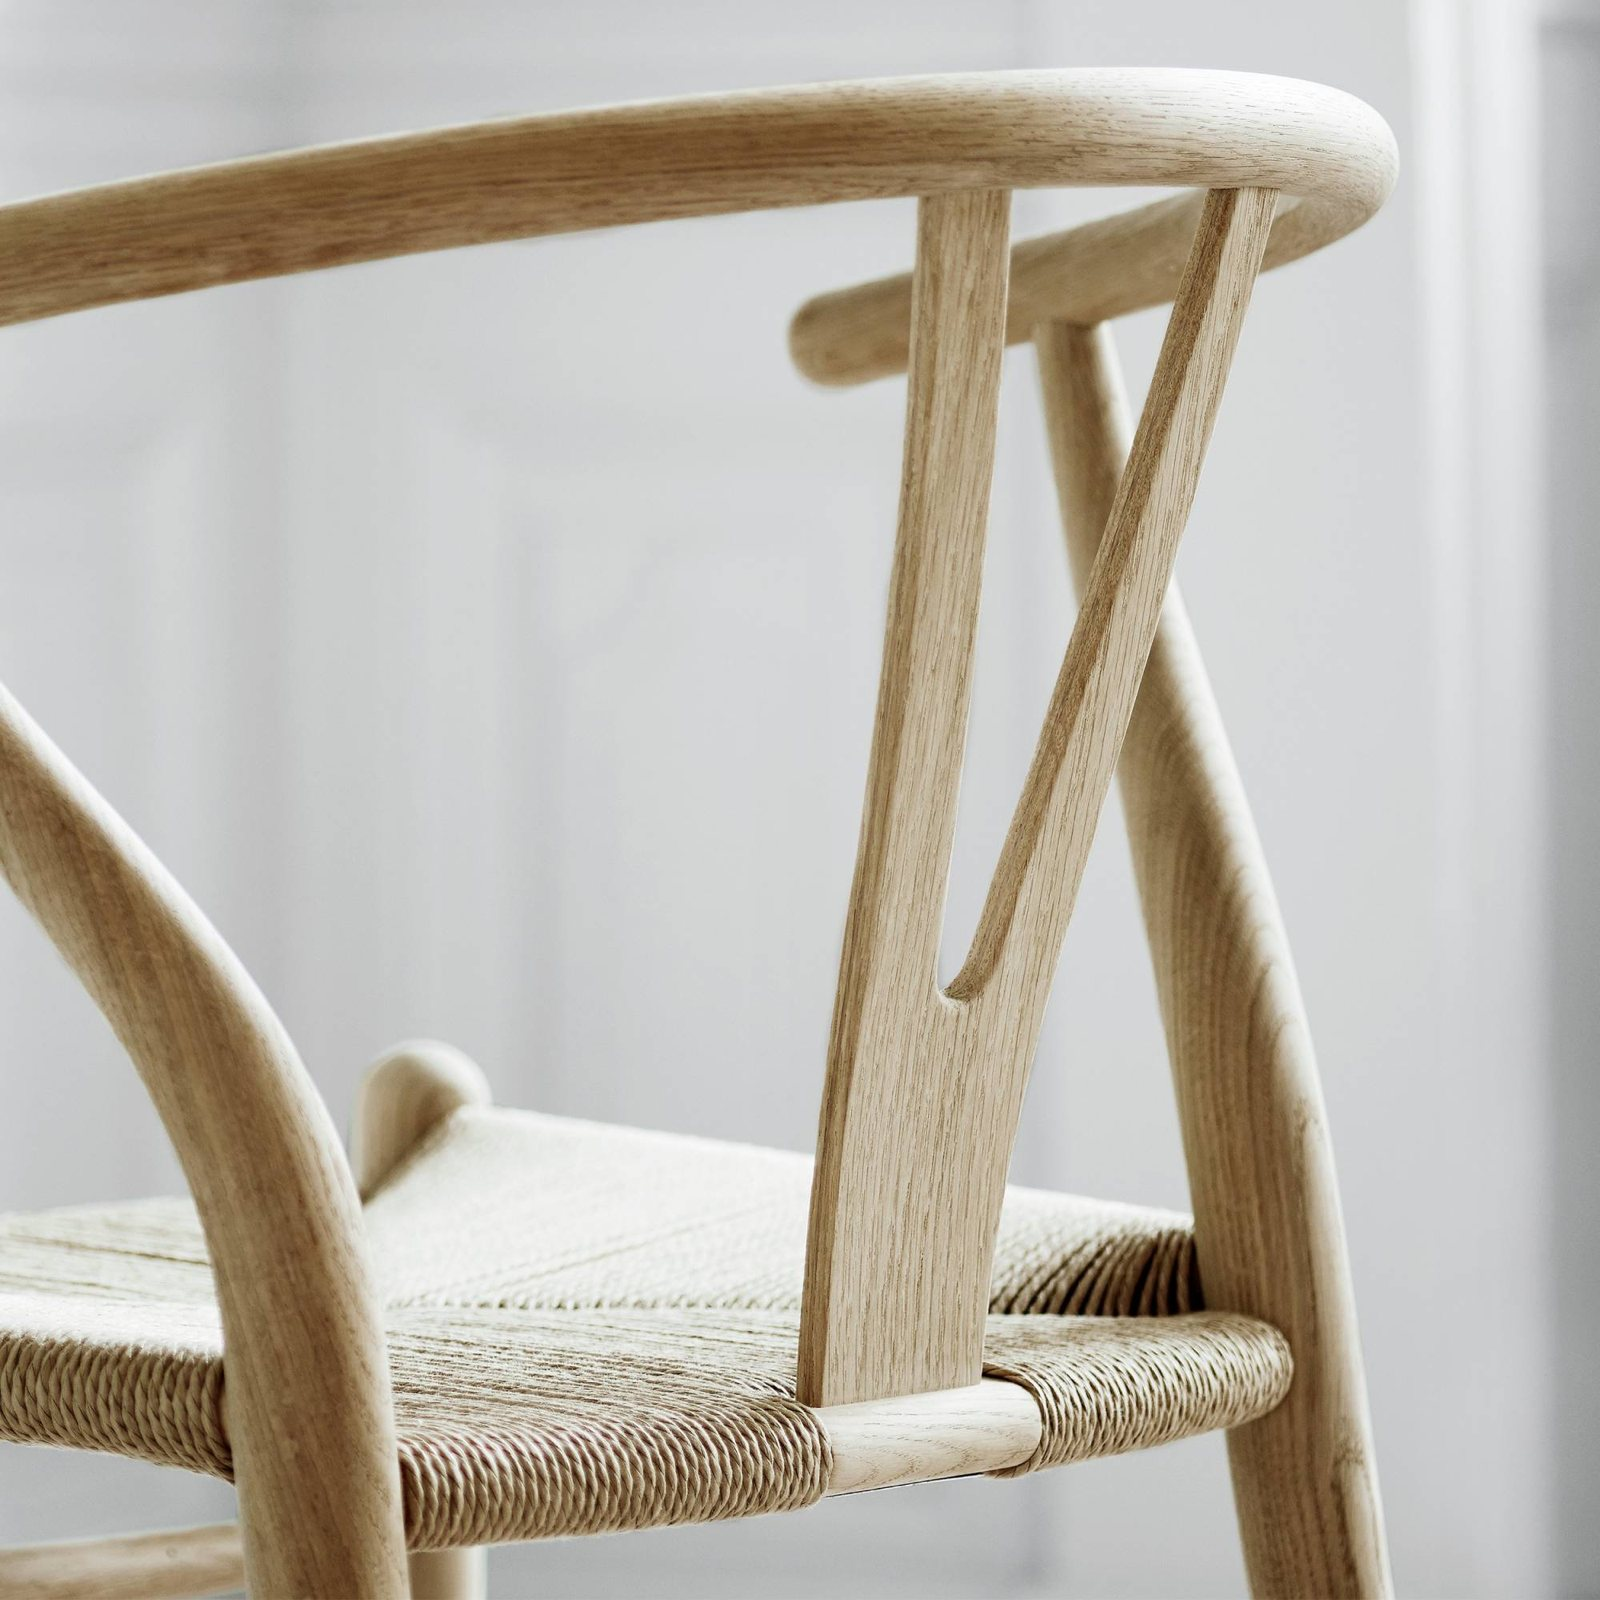 CH24 Wishbone Chair By Hans J Wegner For Carl Hansen